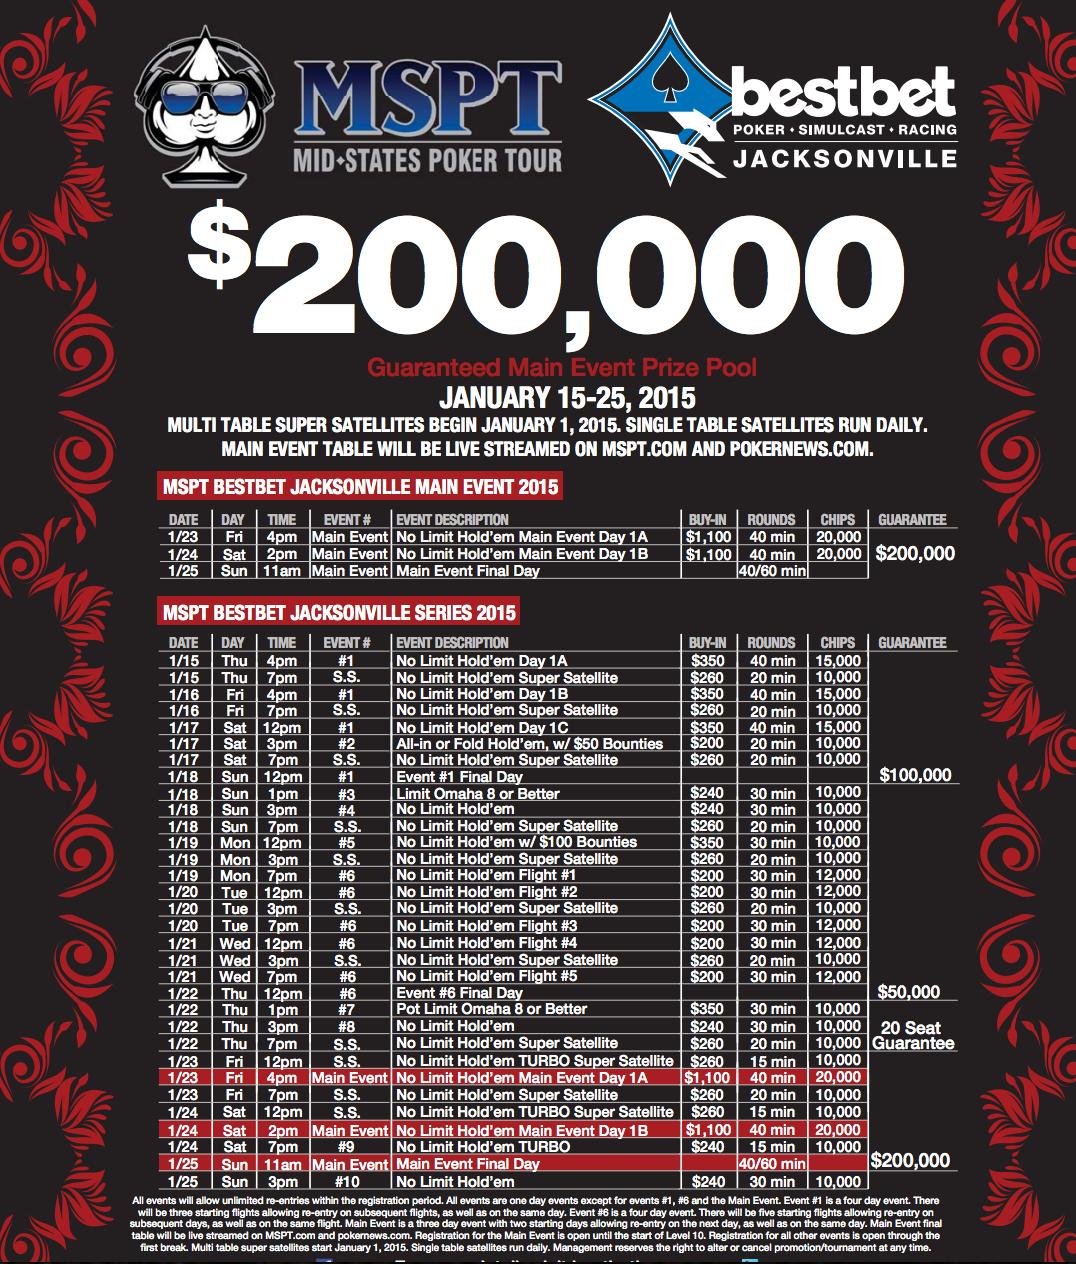 MSPT BestBet Jacksonville 0,000 Guarantee Main Event Gets Underway this Weekend 101